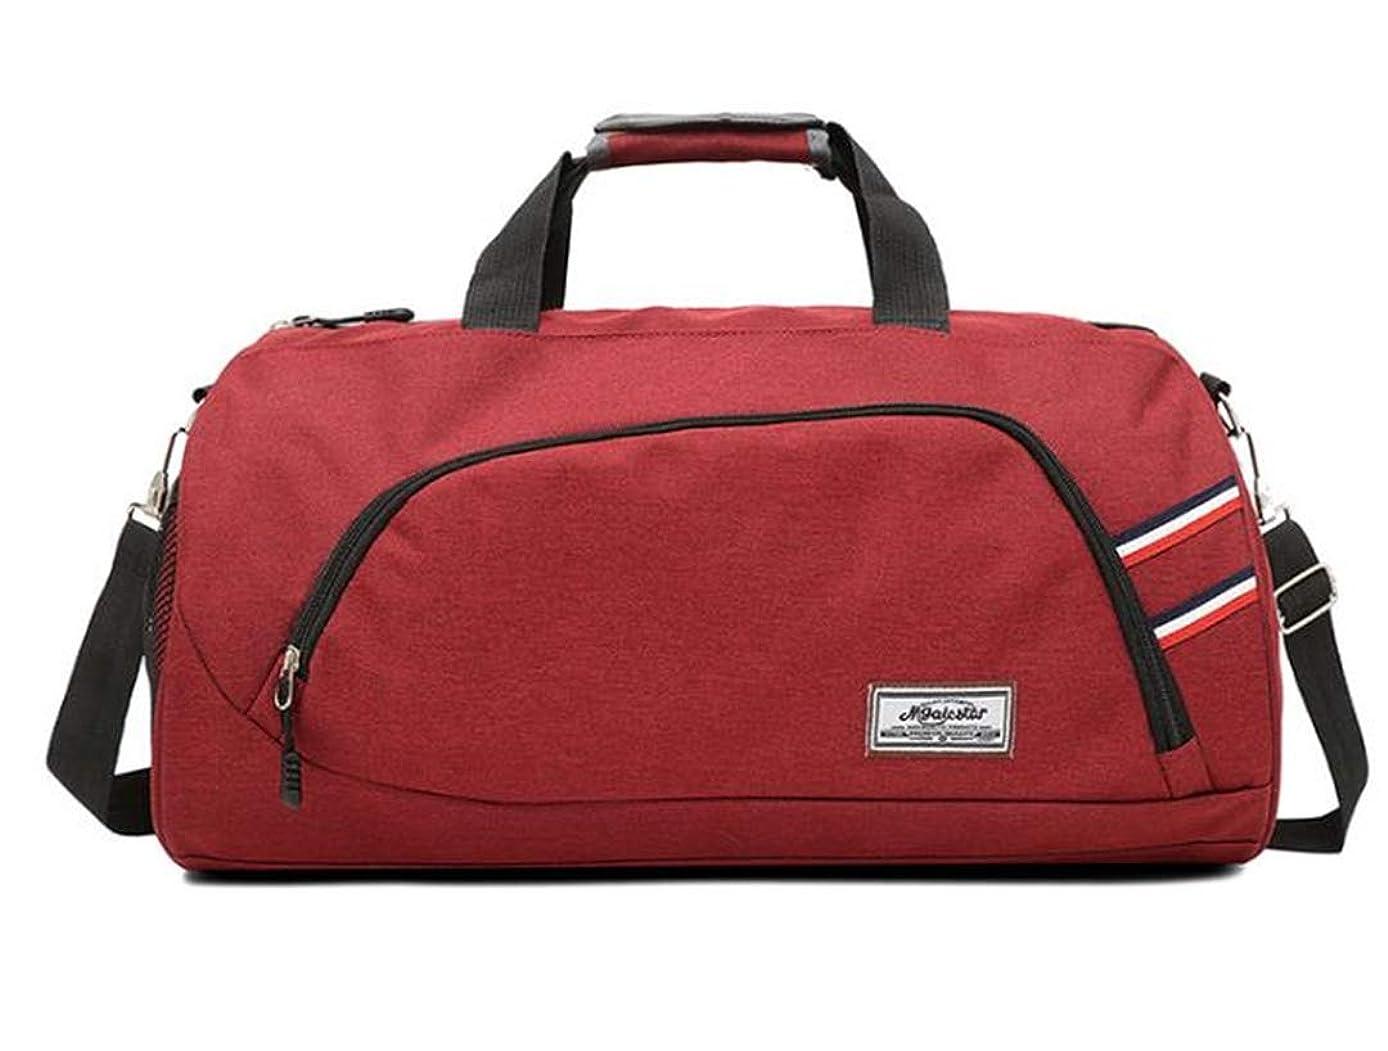 Large Capacity Canvas Travel H bag Casual Men Luggage Duffle Shoulder Bag Big Tote Crossbody Bag Red